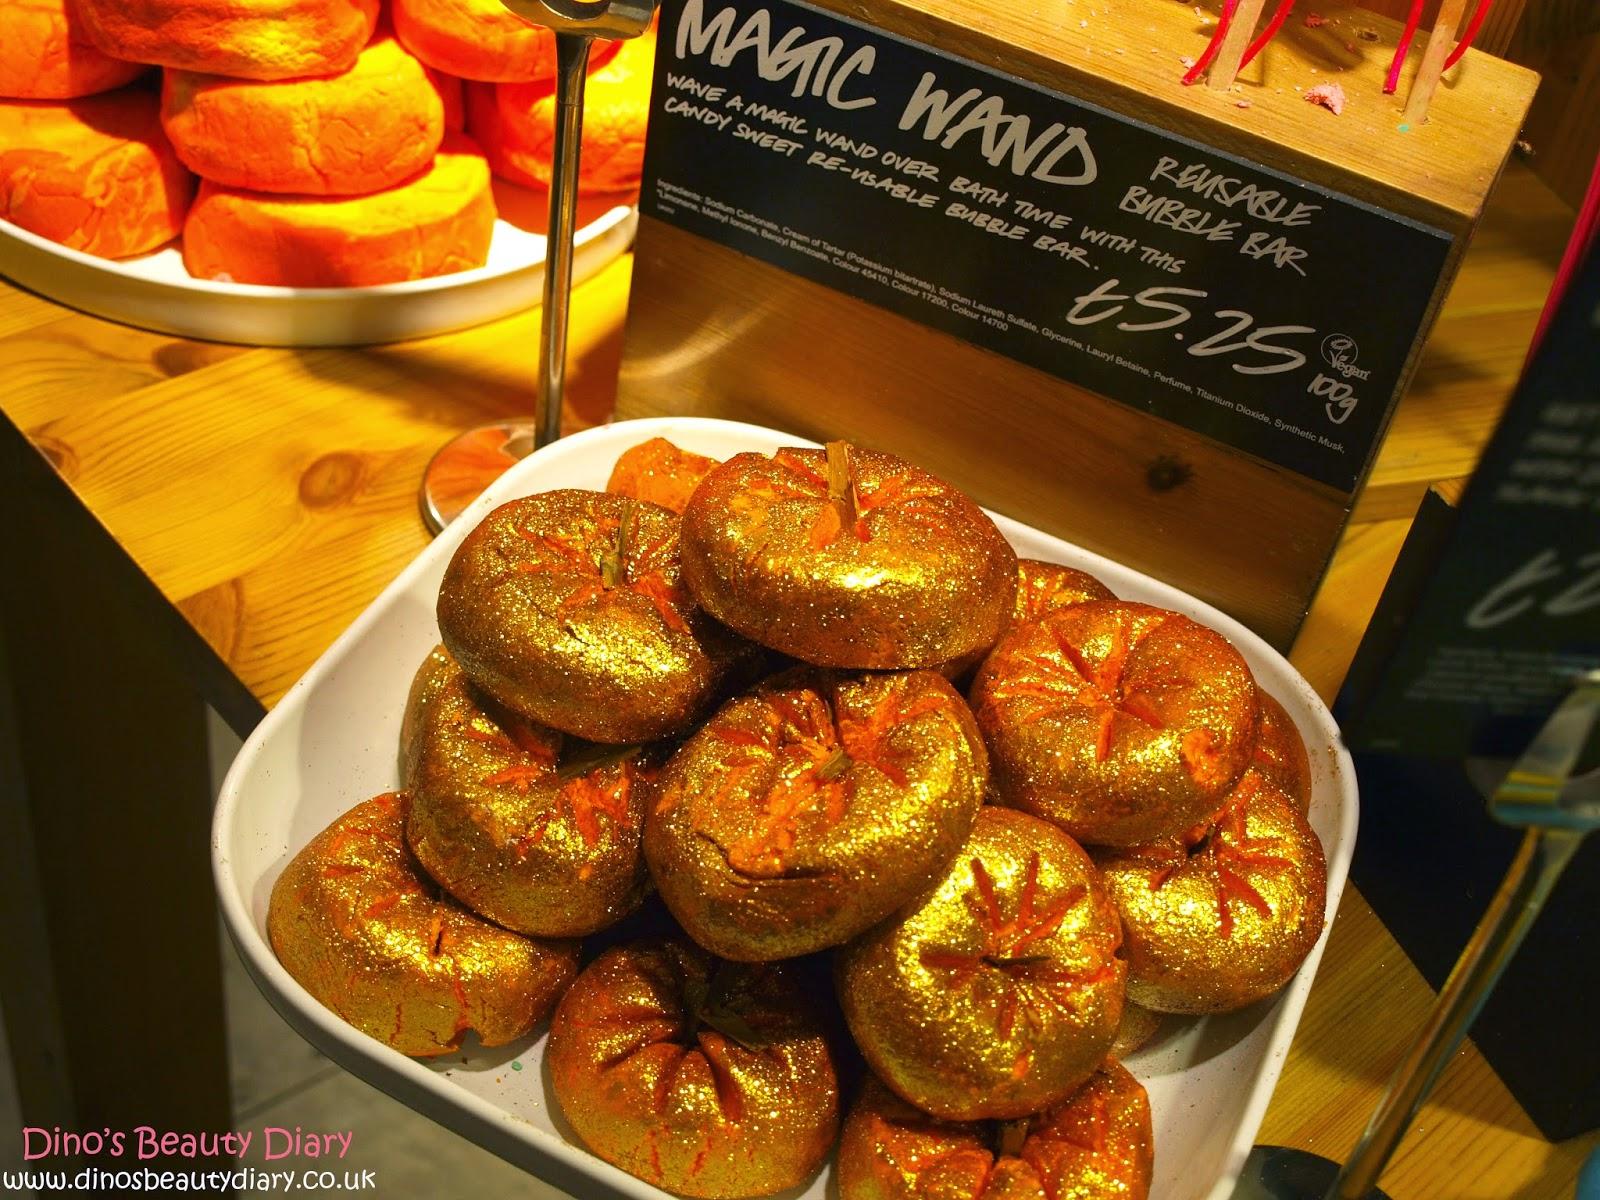 Dino's Beauty Diary - Lush Nottingham Bloggers Event - Sparkly Pumpkin Bubble Bar